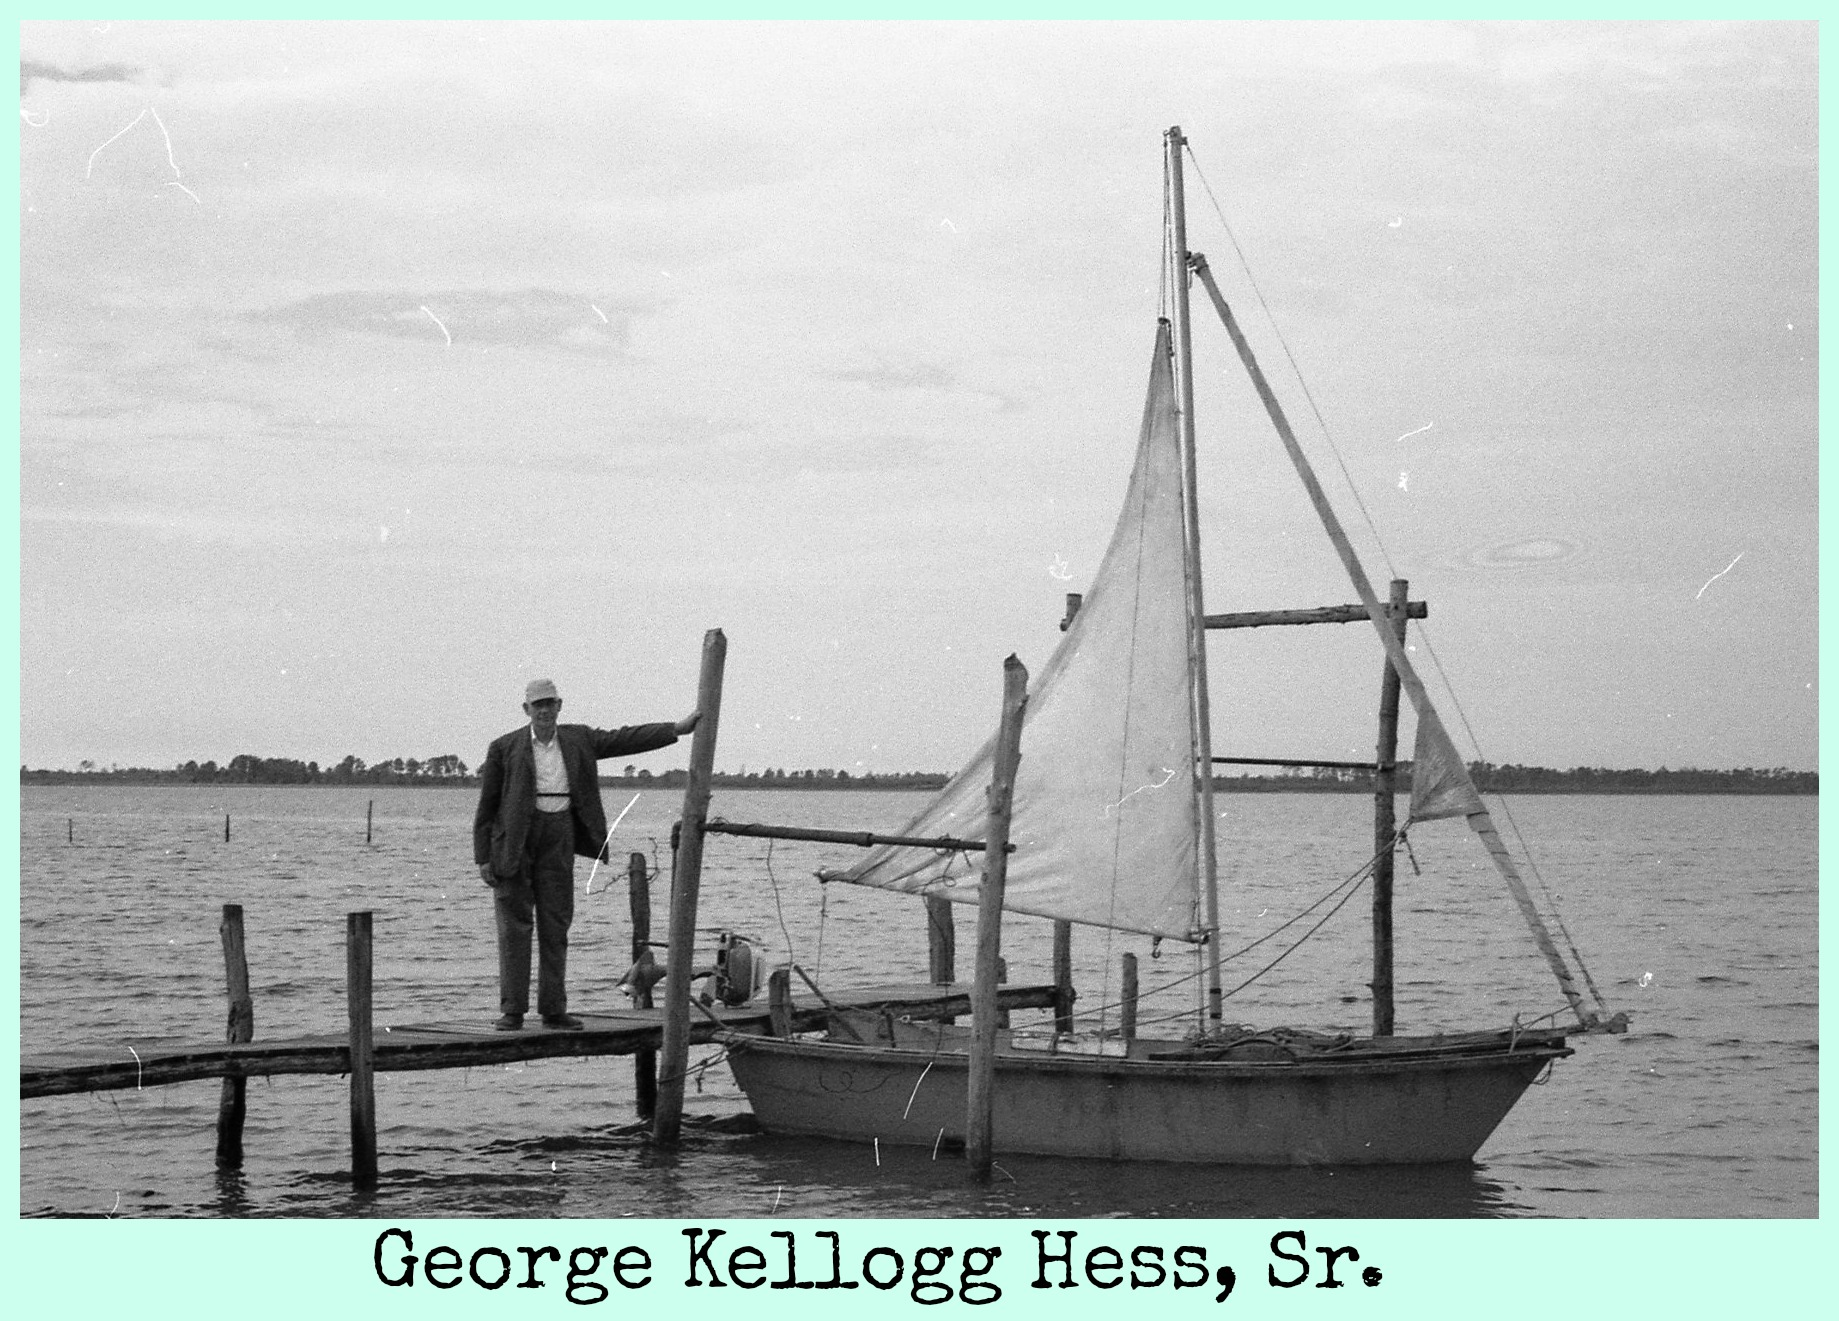 George Kellogg Hess, Sr. on dock by sailboat.jpg